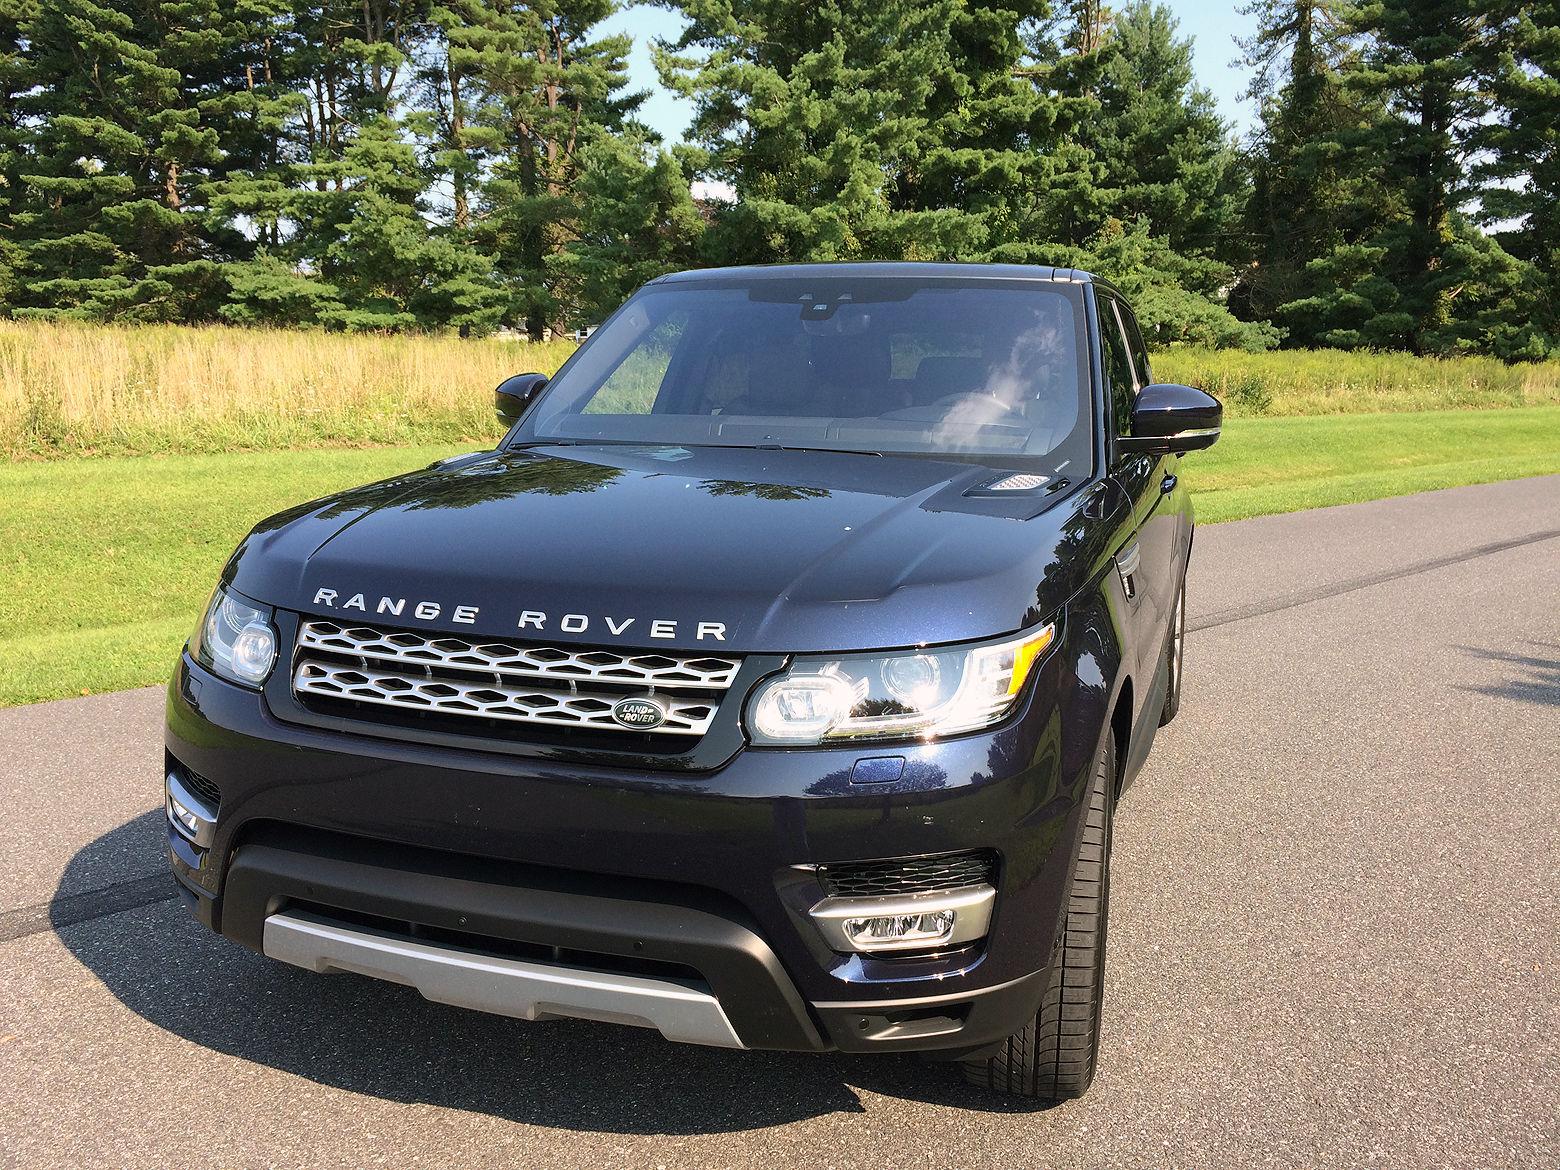 Range Rover Sport Hse Td6 Sel Fuel Mileage With Plenty Of Kick Wtop